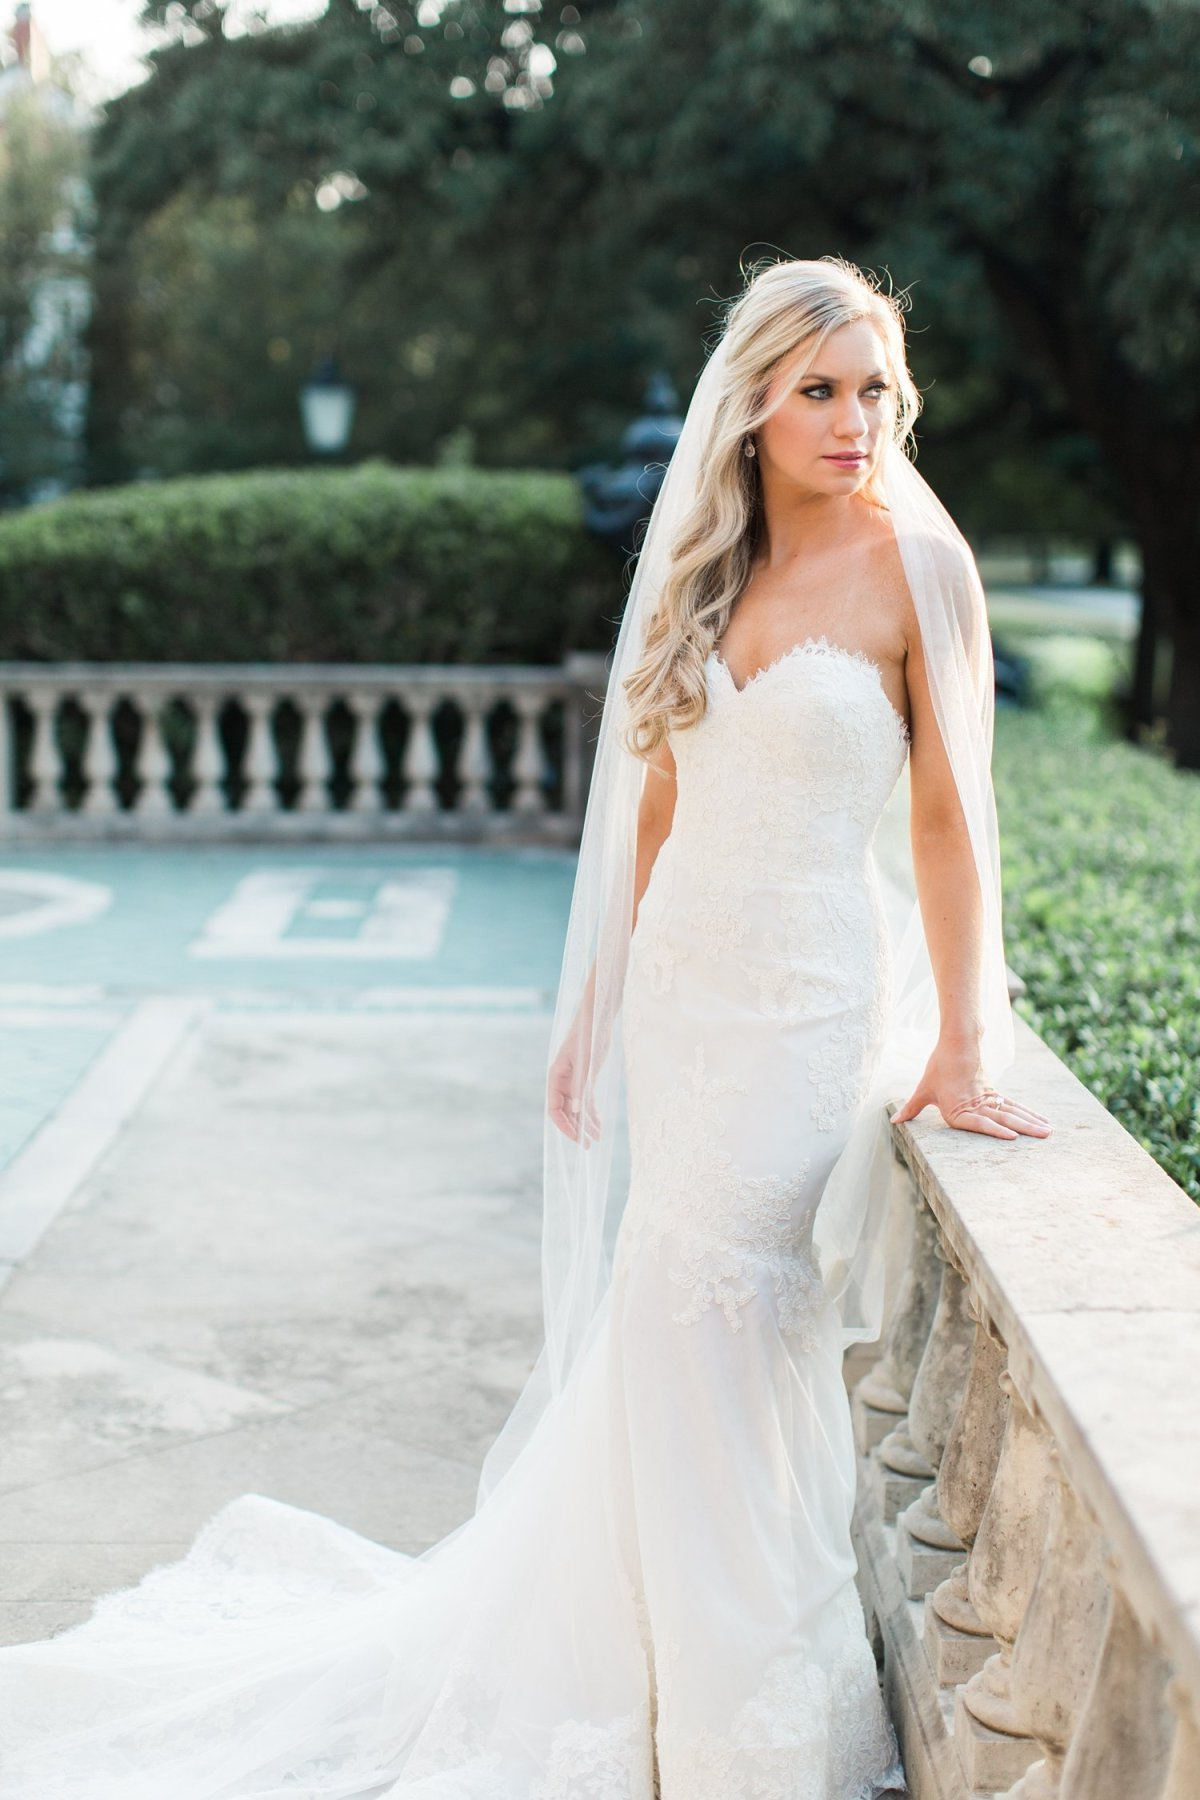 dallas-bridal-wedding-portrait-photographer-aldredge-house-emily-9.jpg